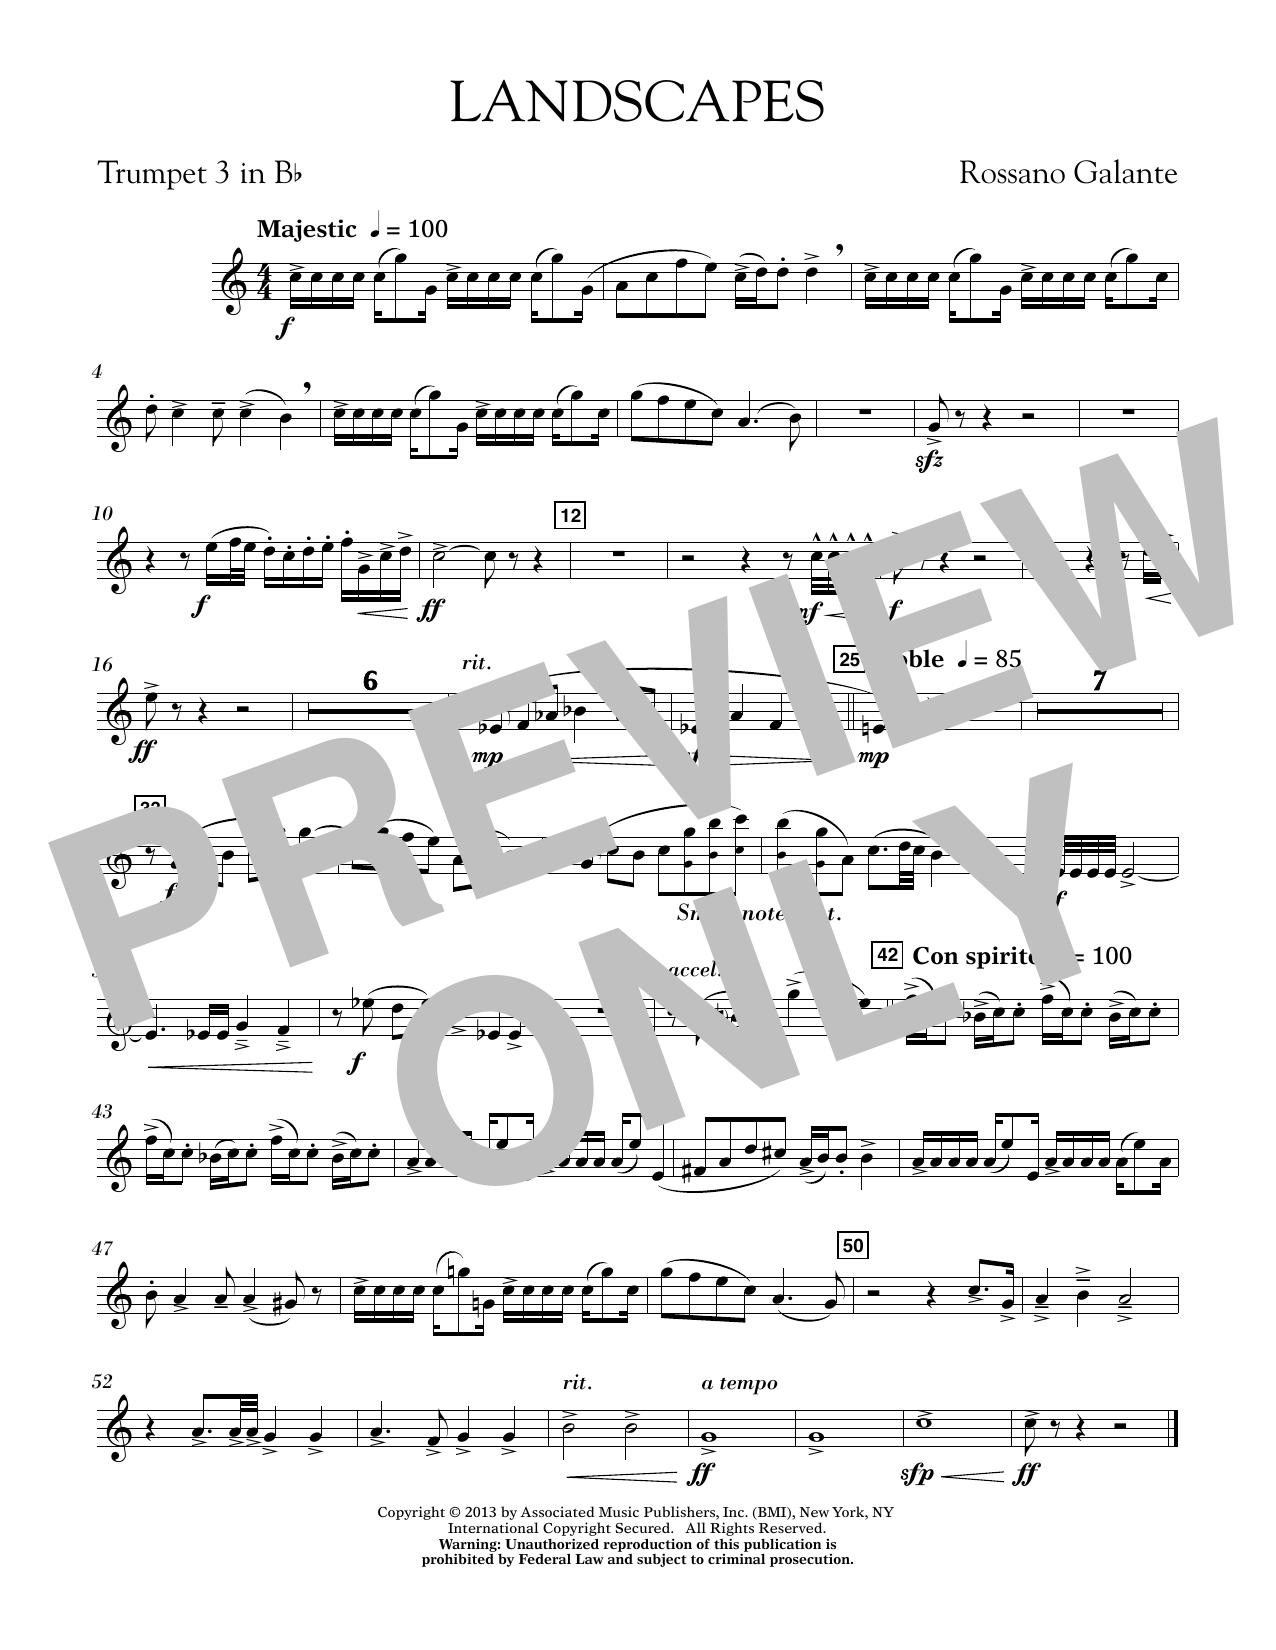 Rosanno Galante Landscapes - Bb Trumpet 3 sheet music notes printable PDF score